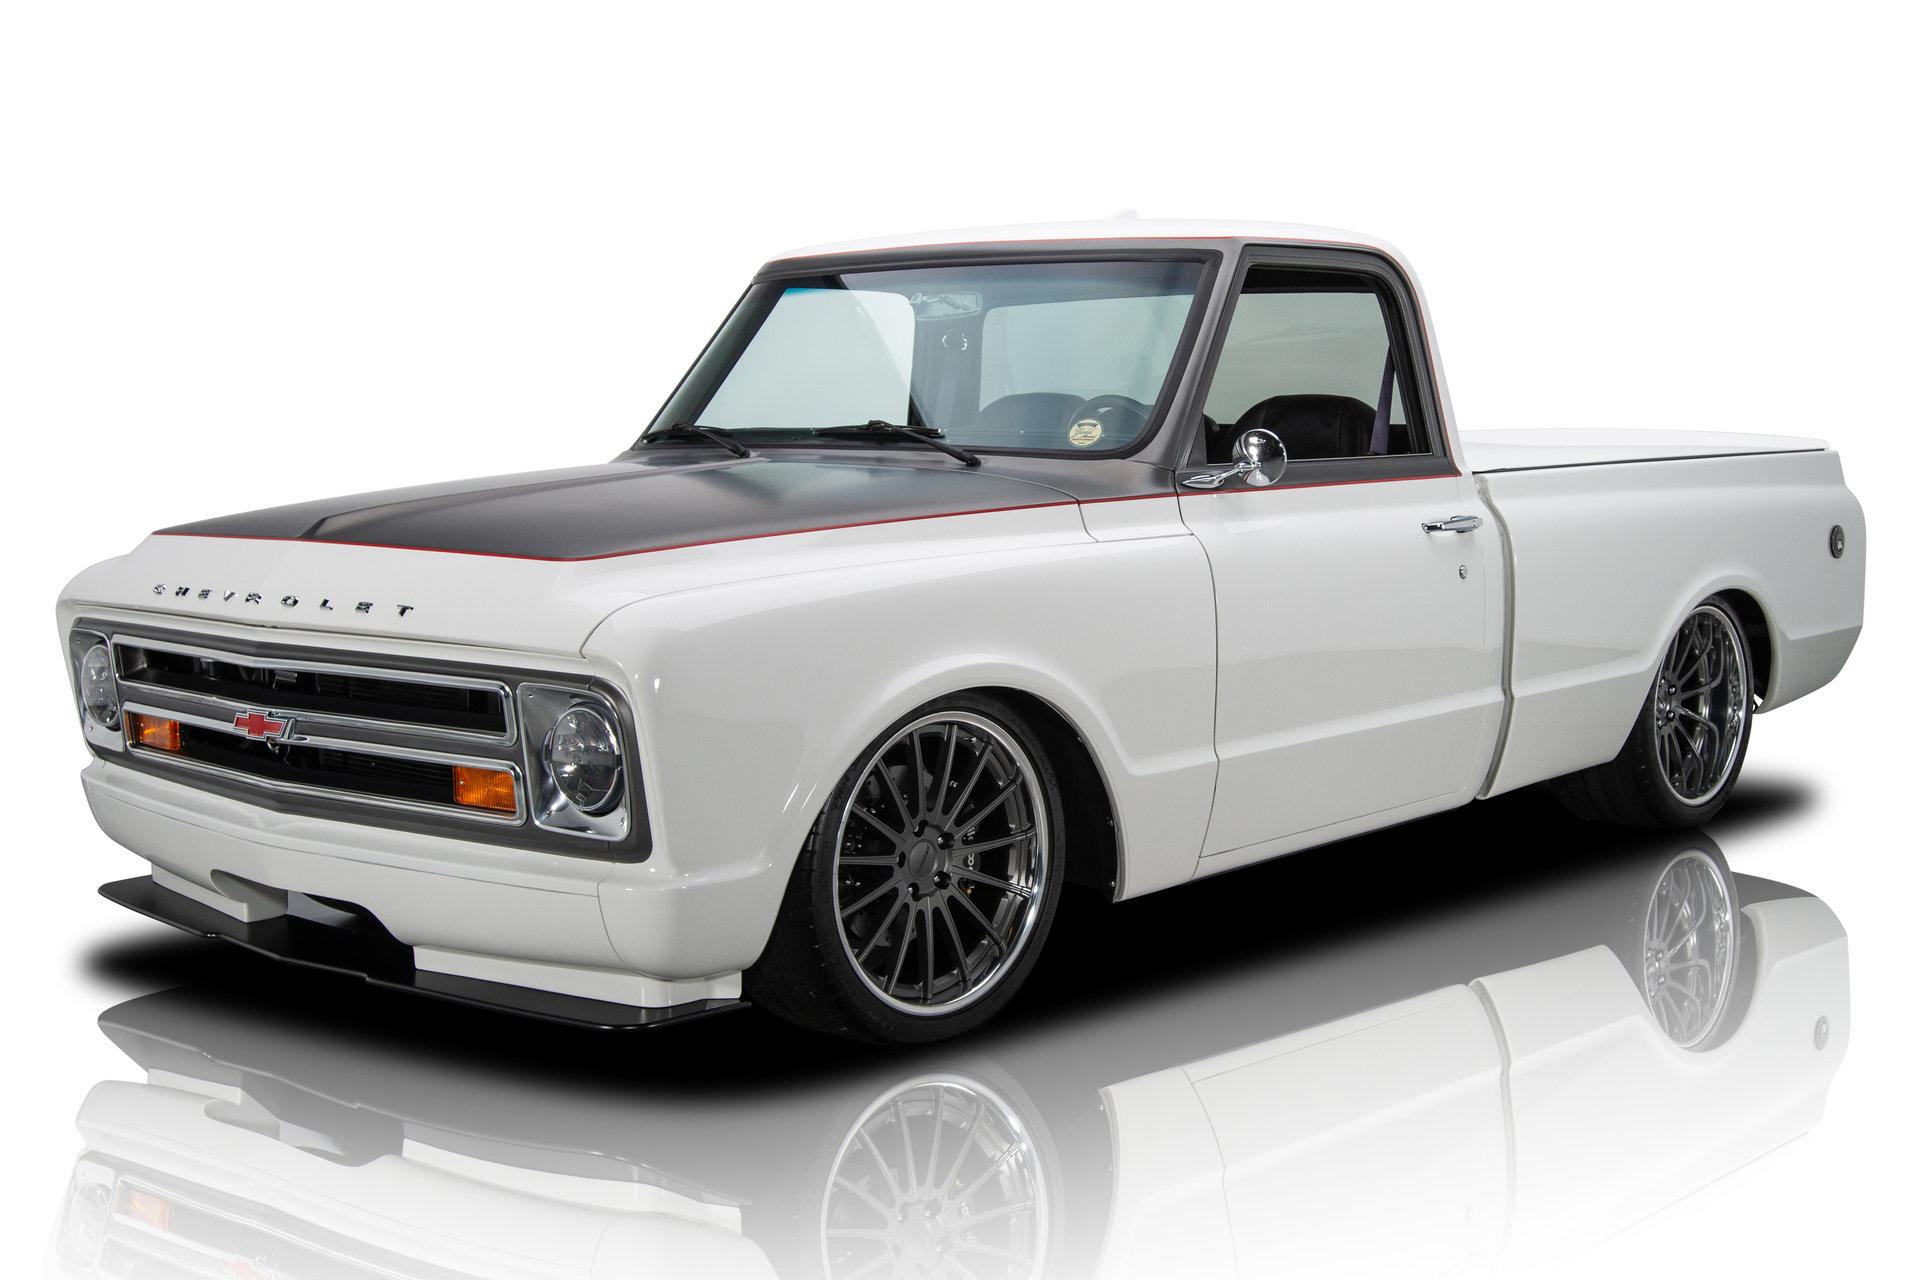 136310 1968 Chevrolet C10 Rk Motors Classic And Performance Cars Crew Cab 4181137f404a97 Hd Pickup Truck